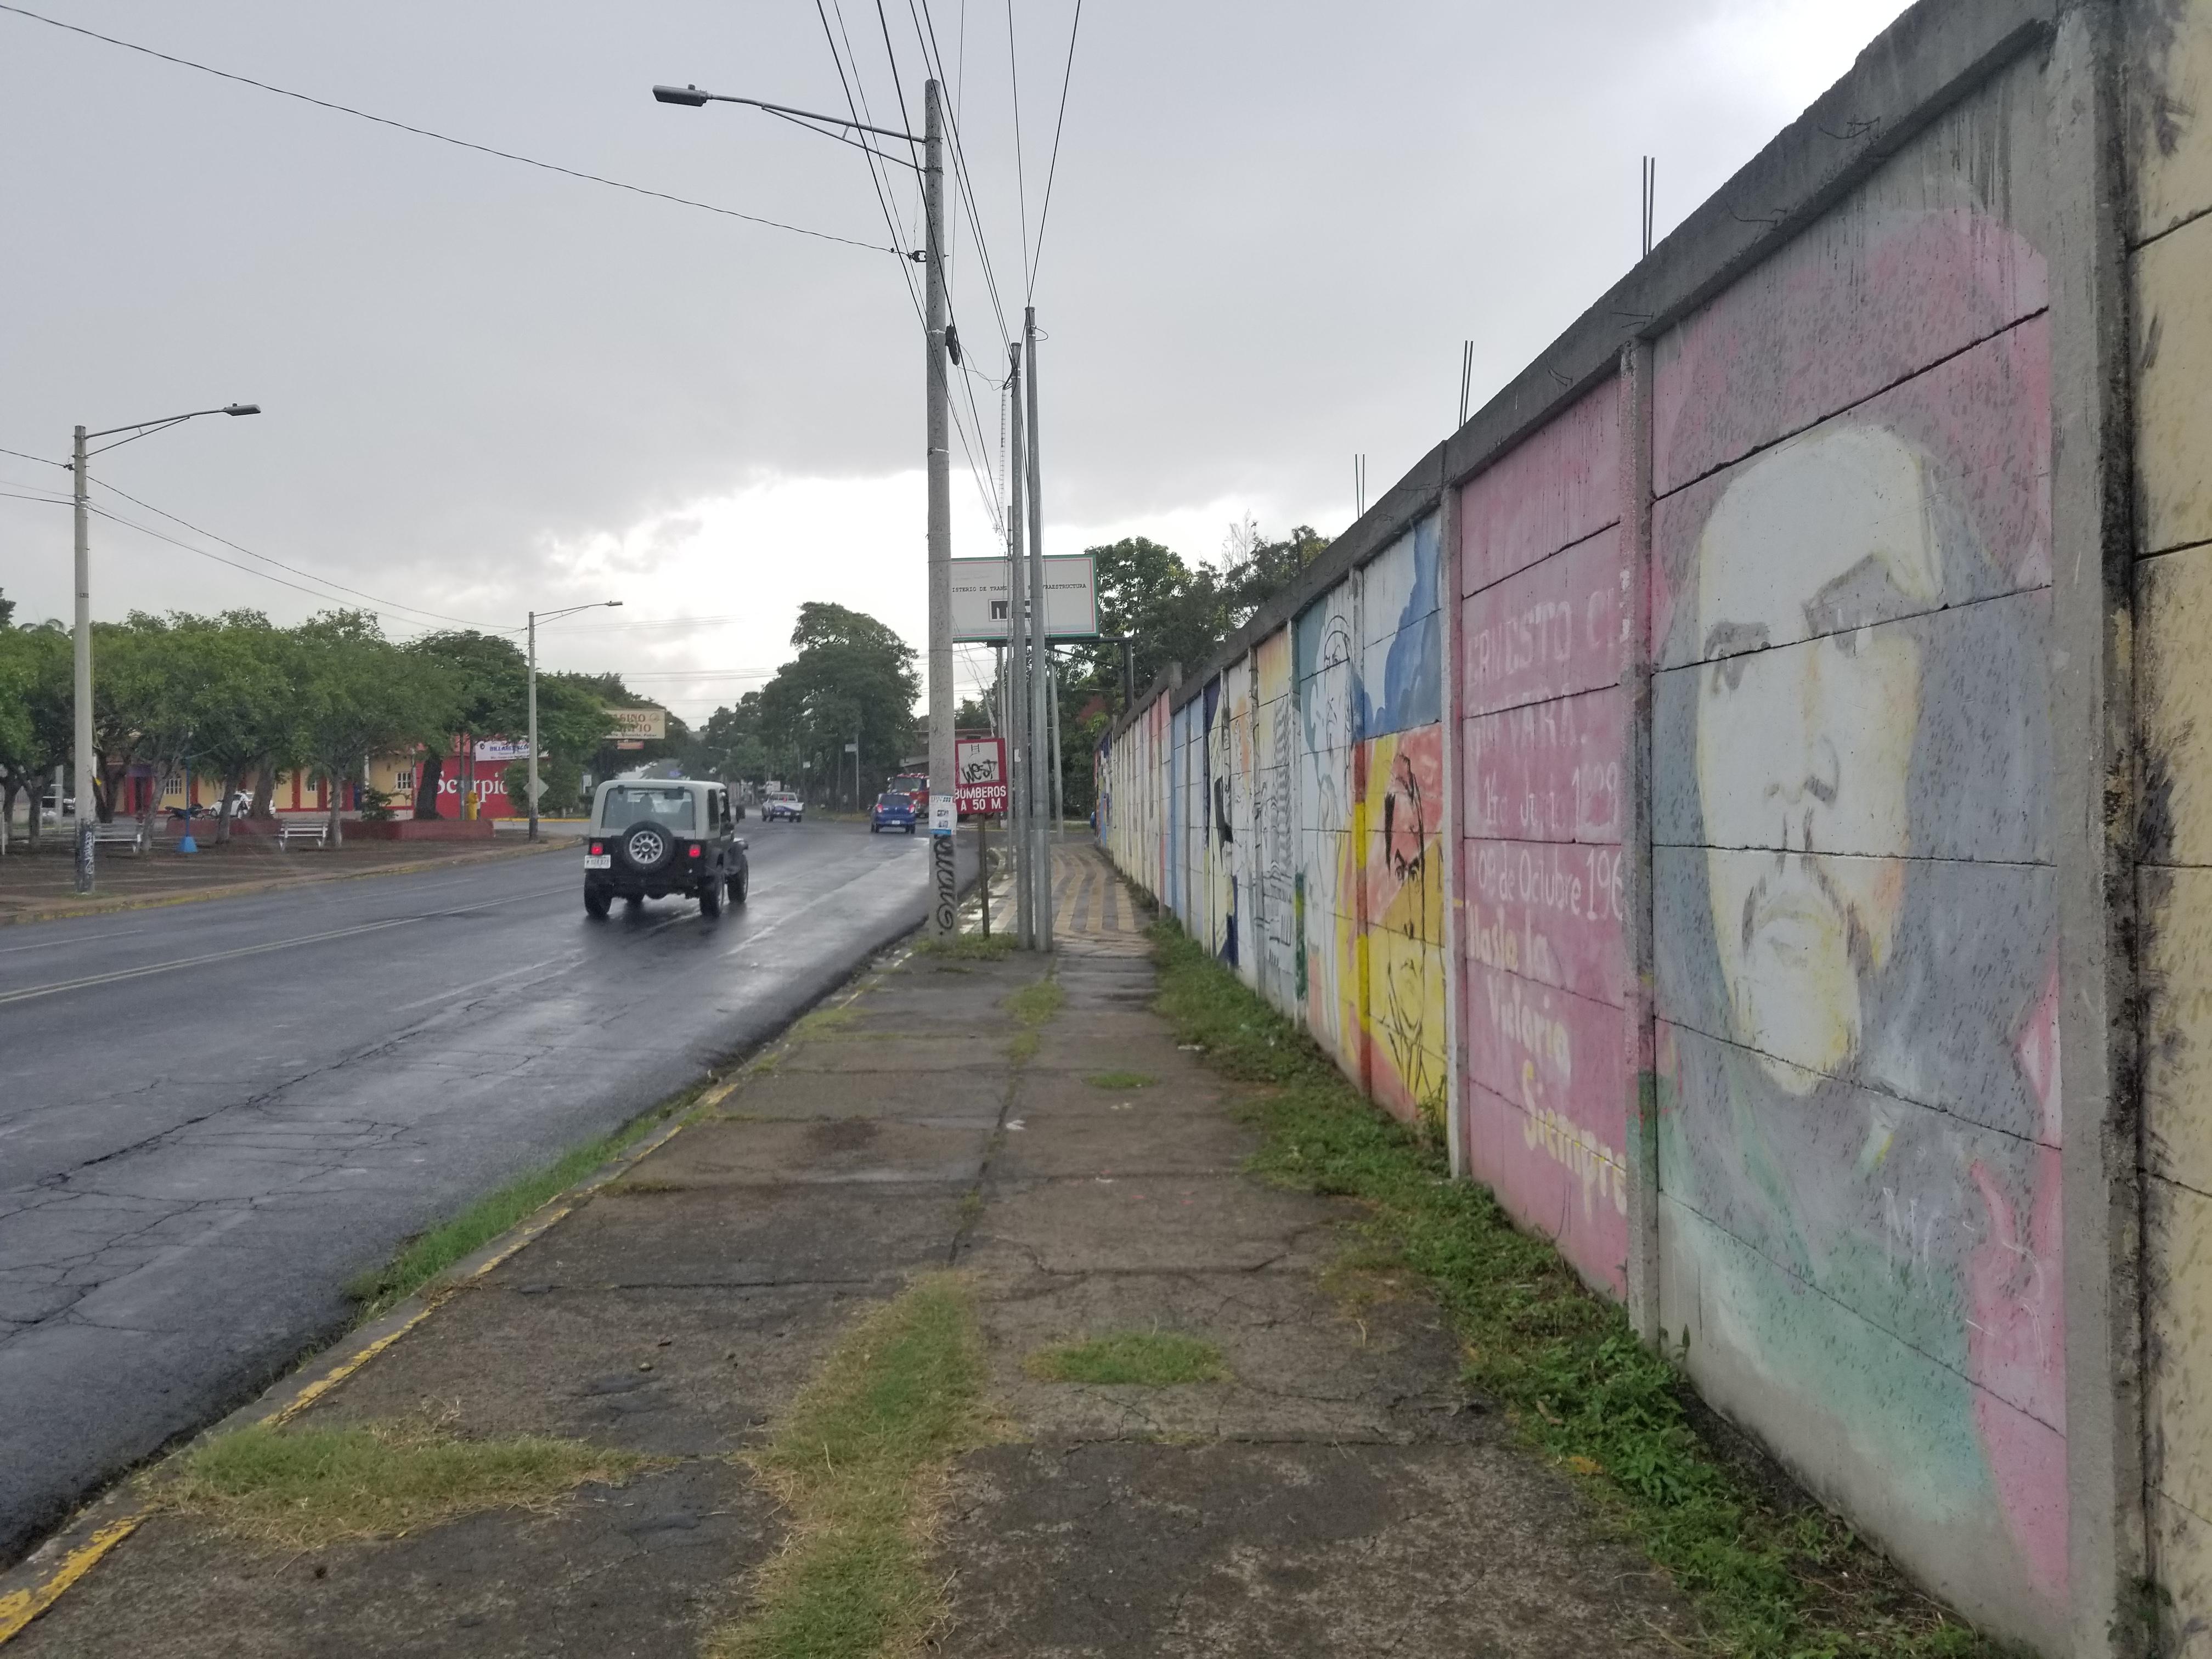 20170830_roadside_mural_near_museo_de_las_victorias_and_parque_general_sandino managua, nicaragua (2